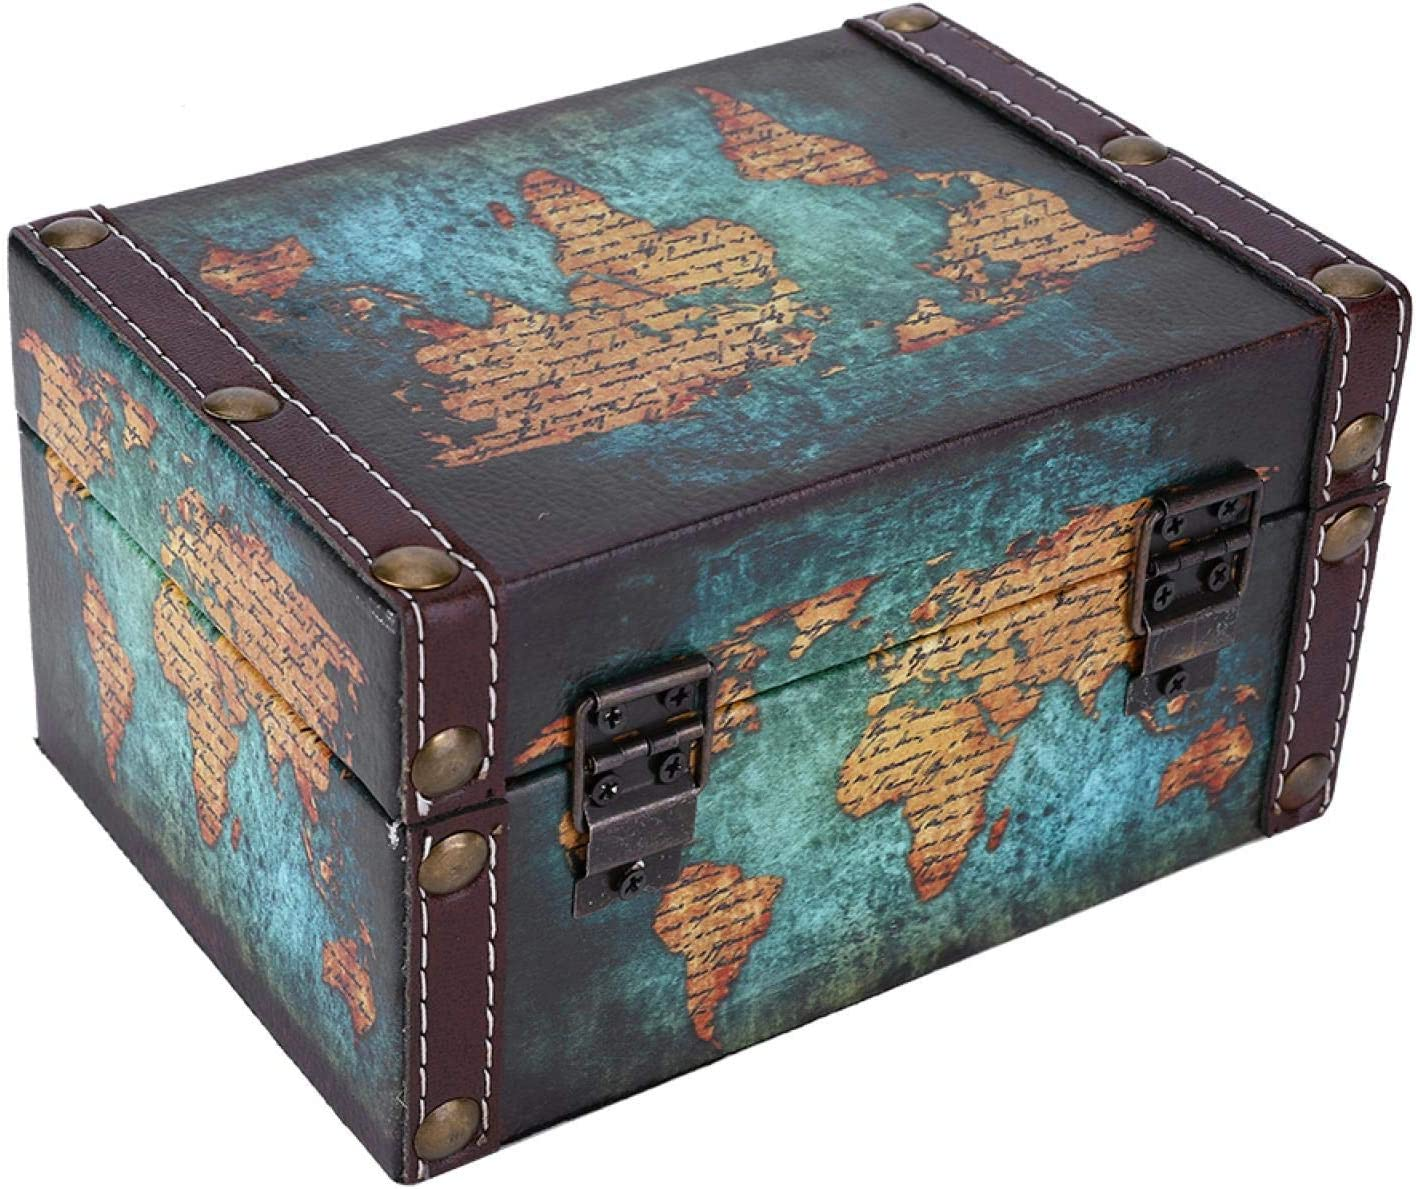 Caja de baratijas de Madera Duradera Organizador de baratijas SALUTUYA A Prueba de Polvo para el d/ía de la Madre para Anillos mam/á 2208A-06-Green Map